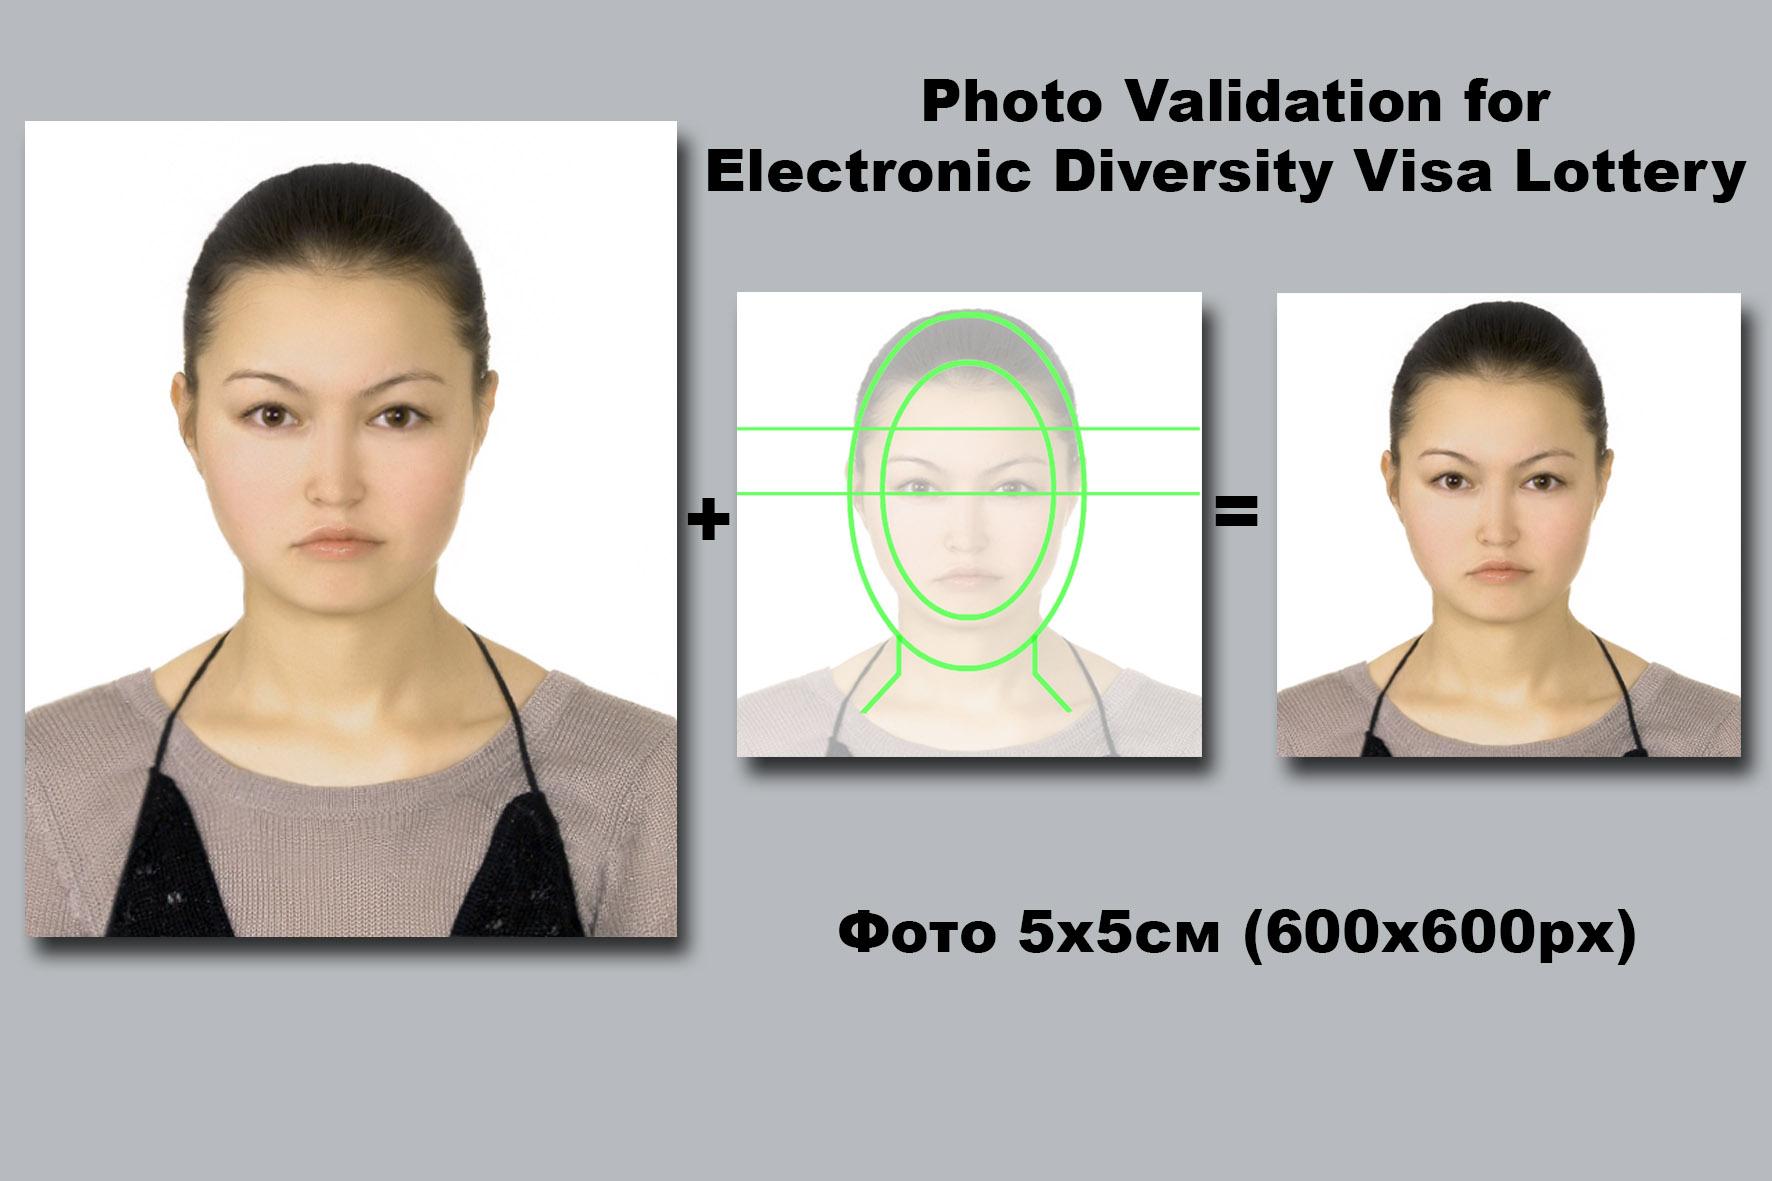 Electronic Diversity Visa Lottery